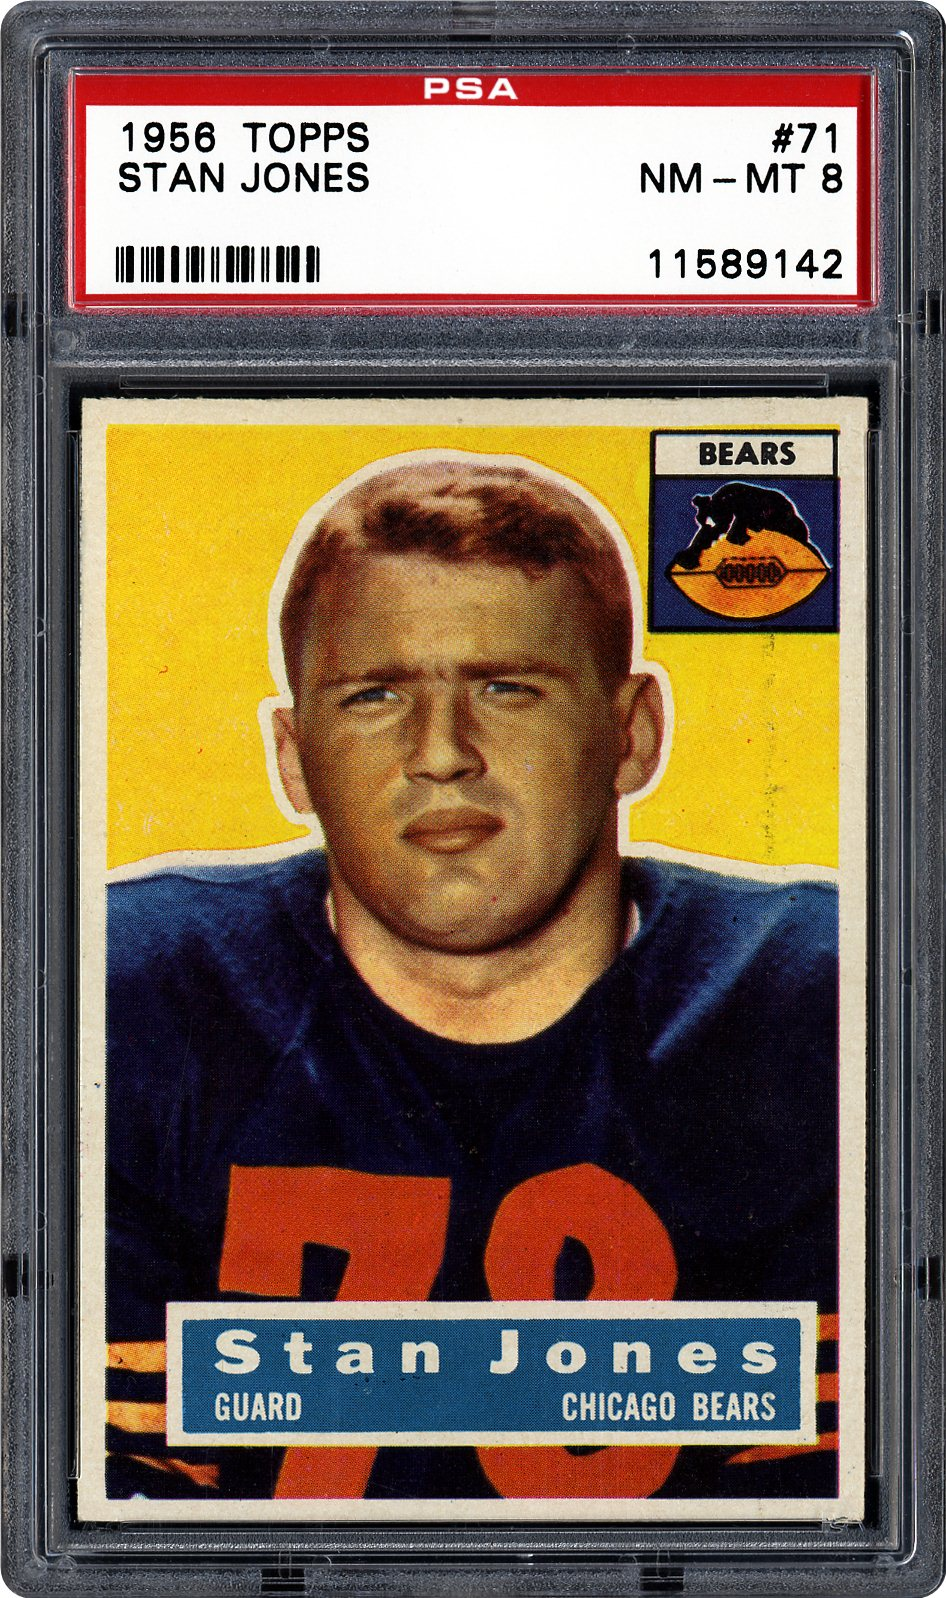 1956 Topps Stan Jones   PSA CardFacts™